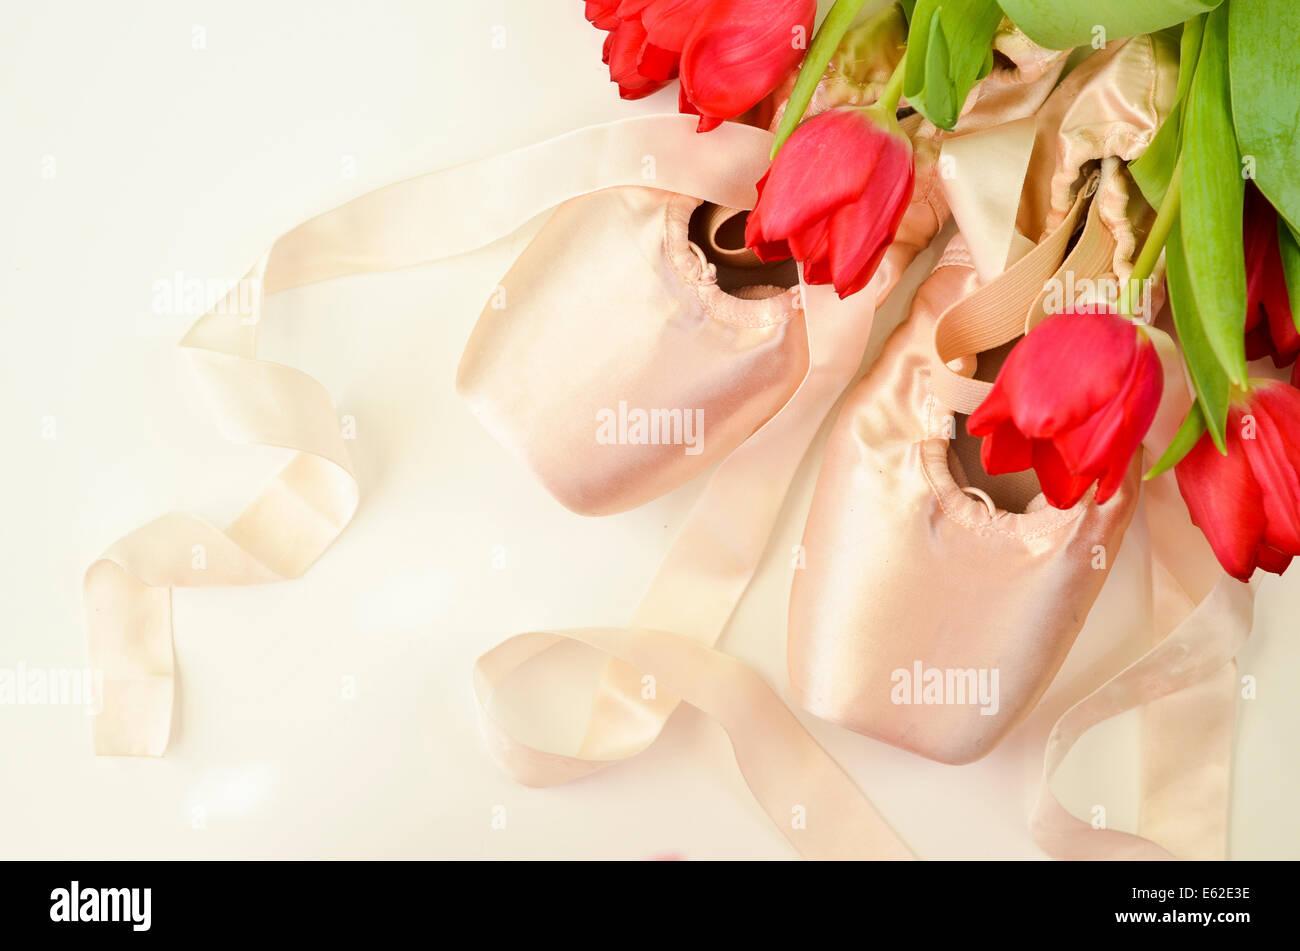 Dance Of Flowers Immagini   Dance Of Flowers Fotos Stock - Alamy a7f81b80e6b5